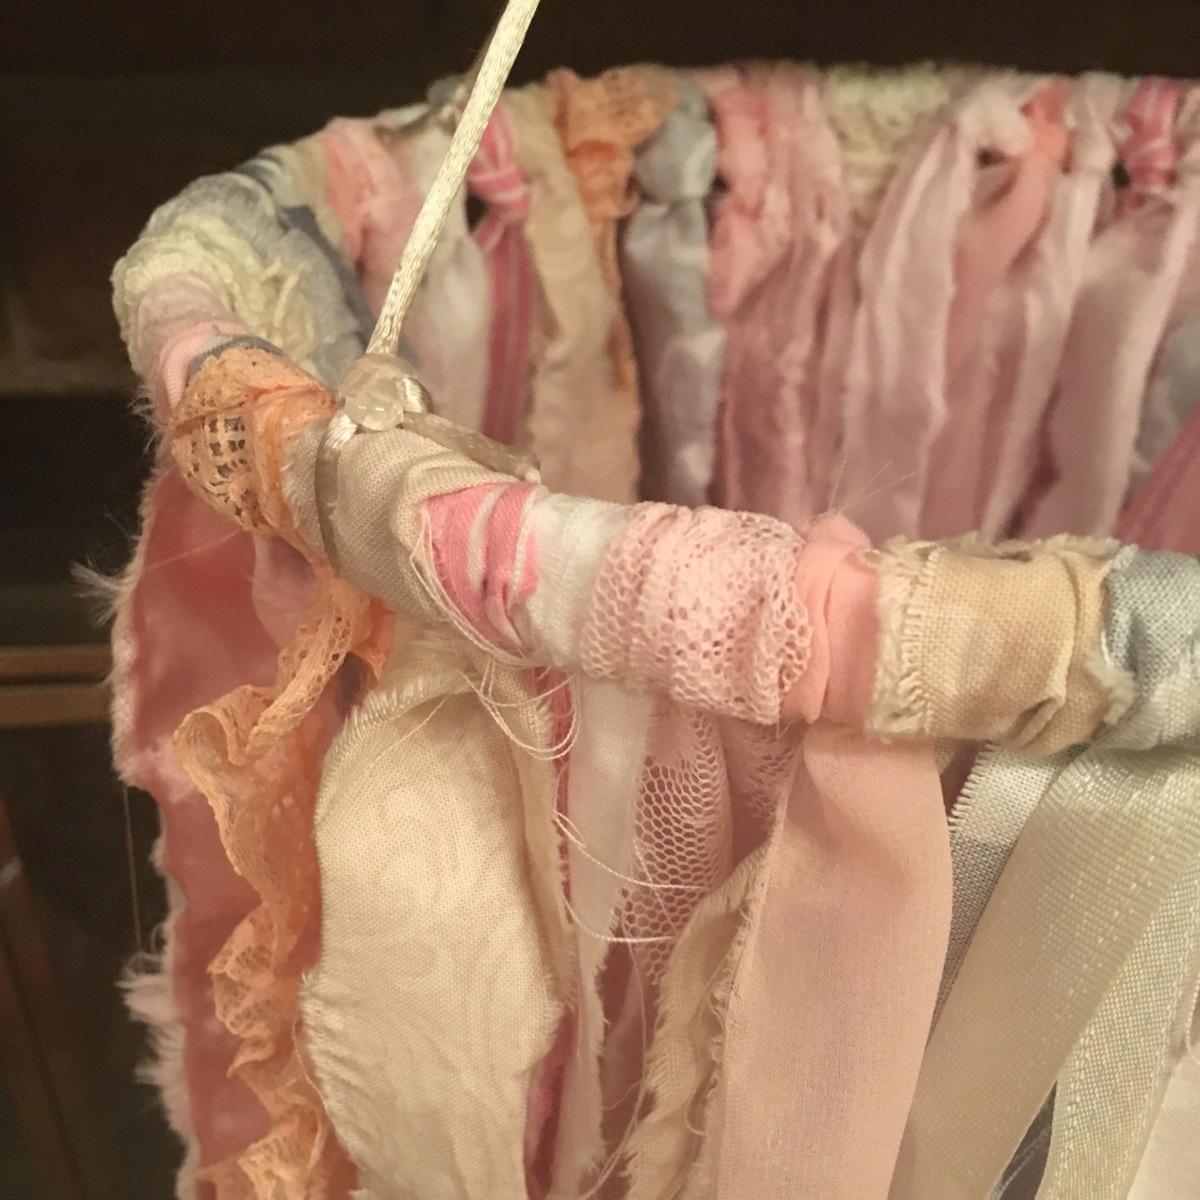 DIY No-Sew Ribbon/Fabric Baby MobileTutorial!